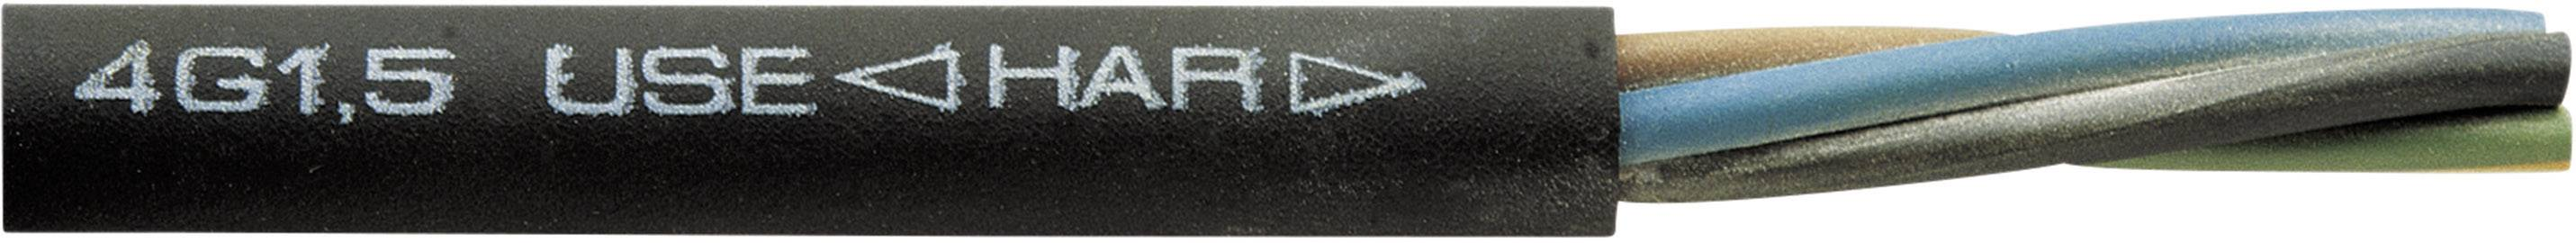 El. kábel hadicový H07RN-F Faber Kabel 050038, 1 x 35 mm², čierna, metrový tovar